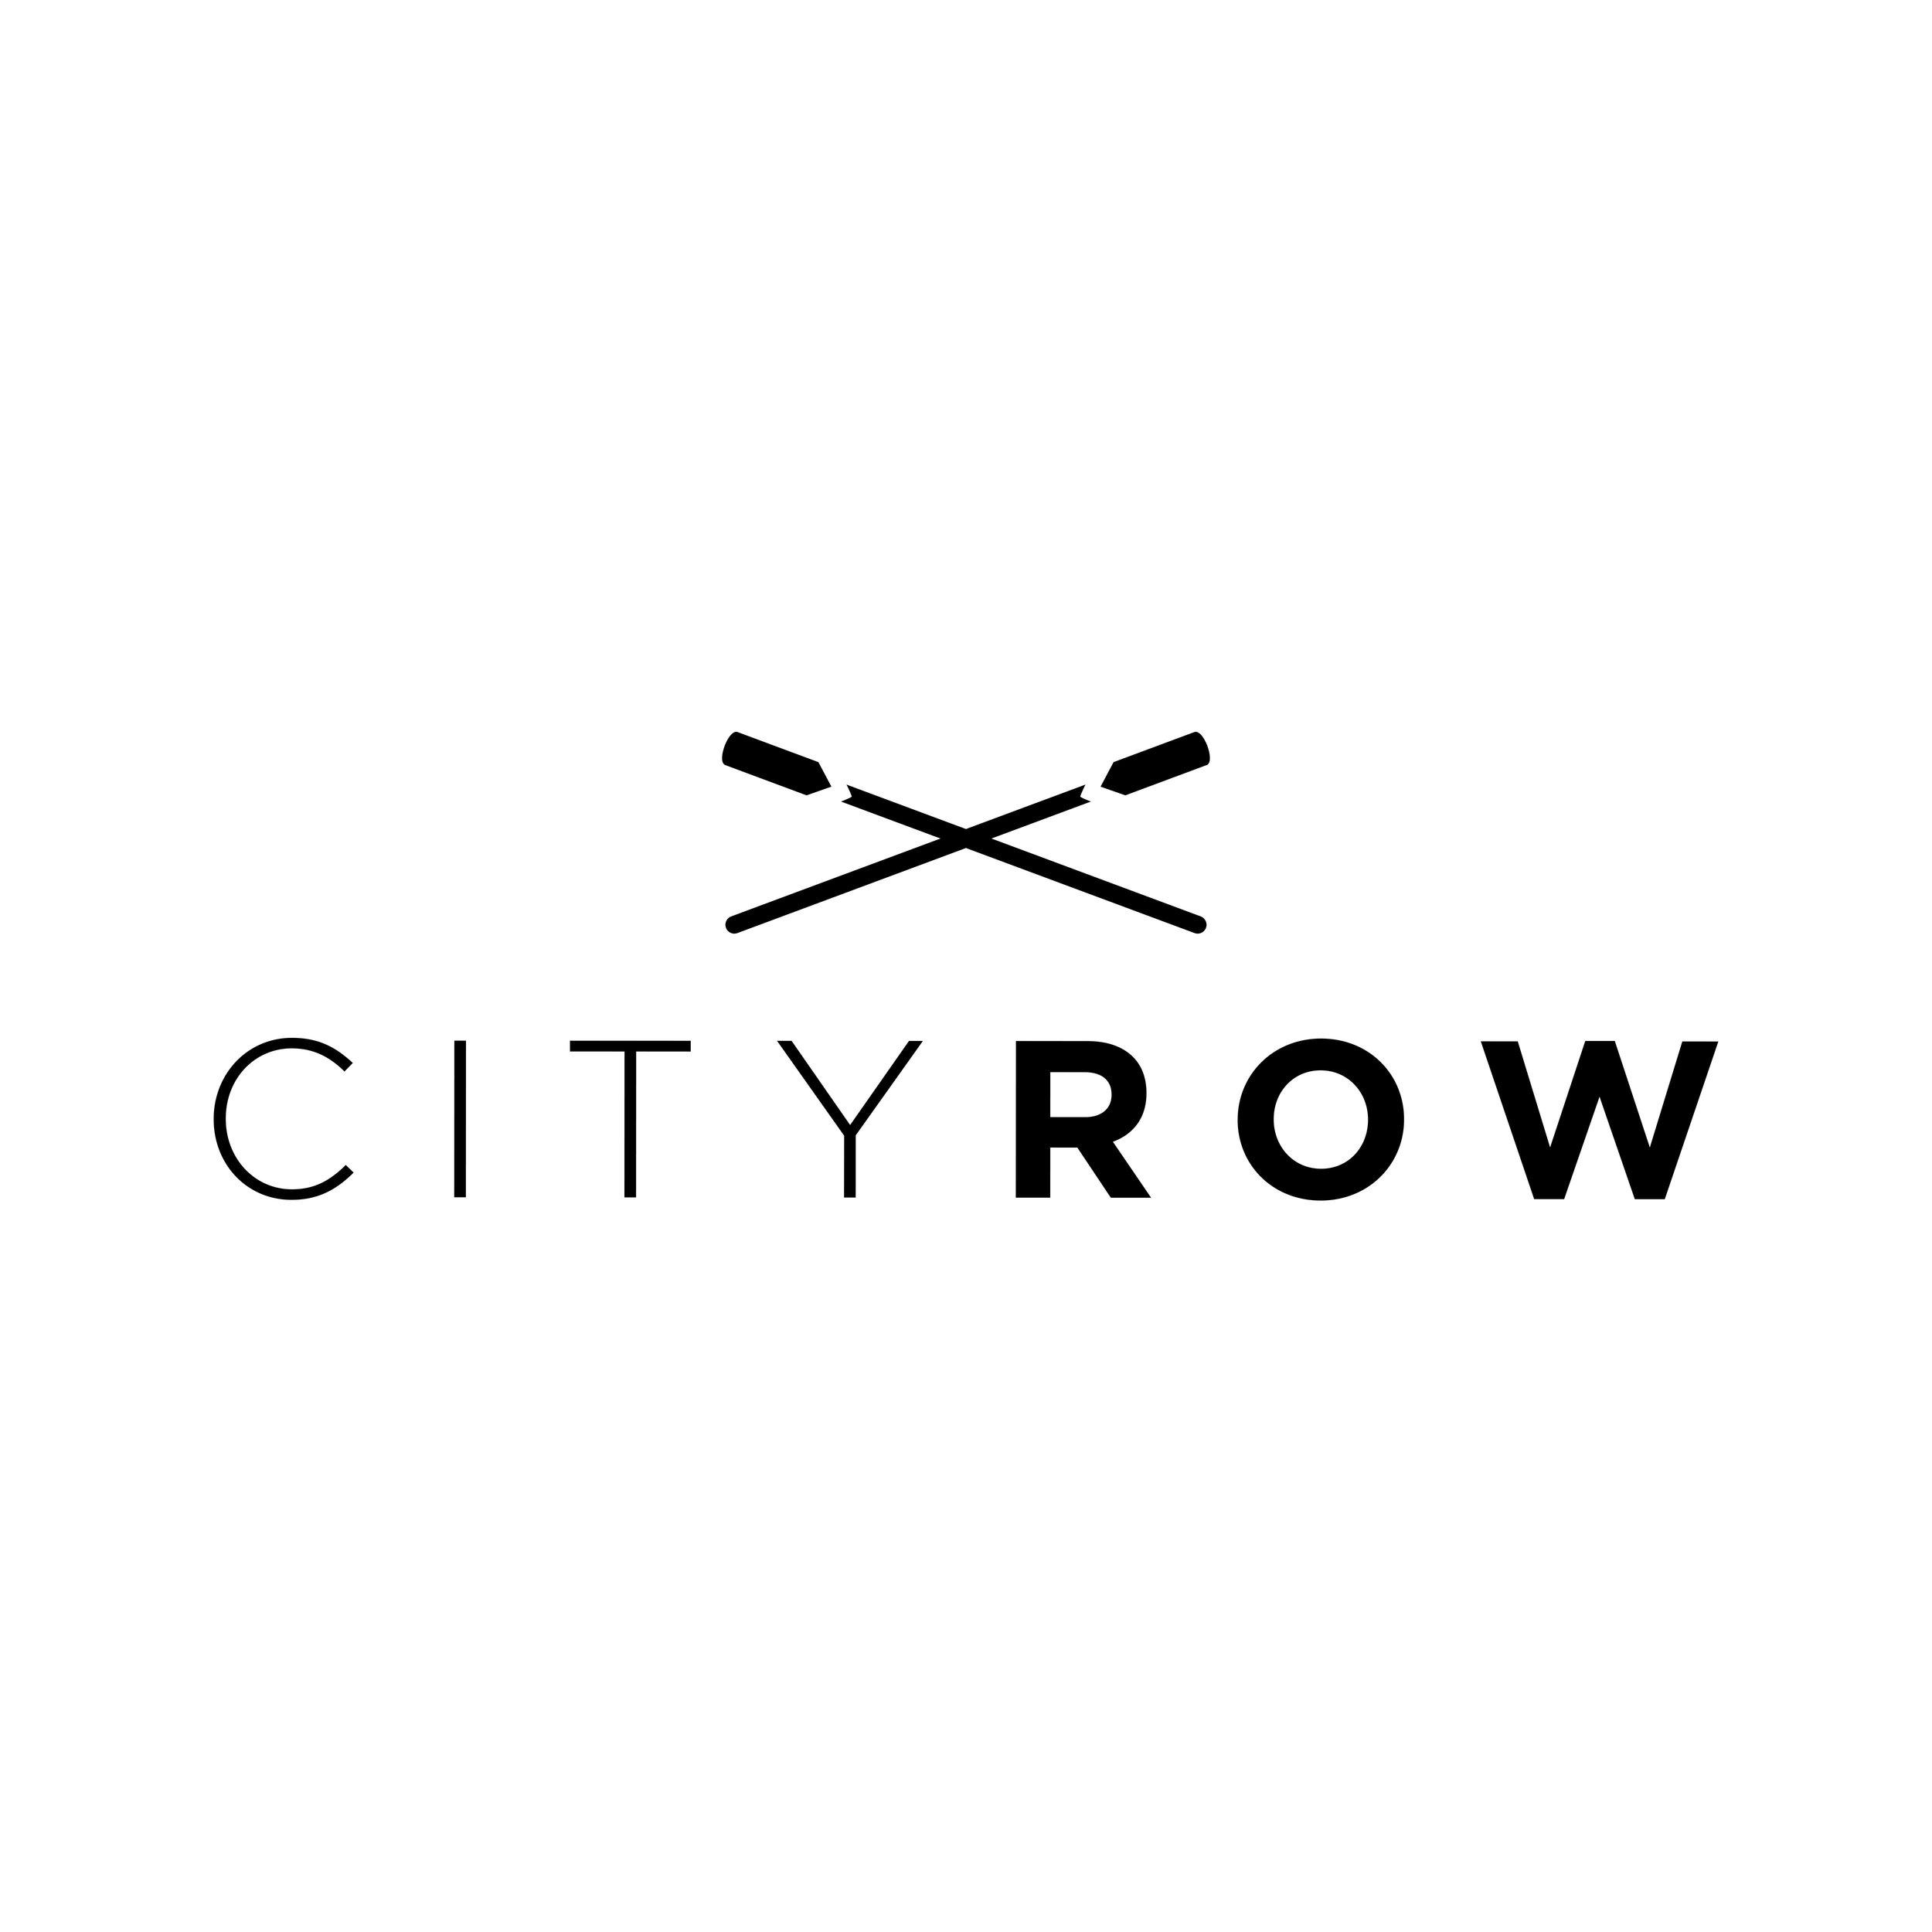 CITYROW.jpg